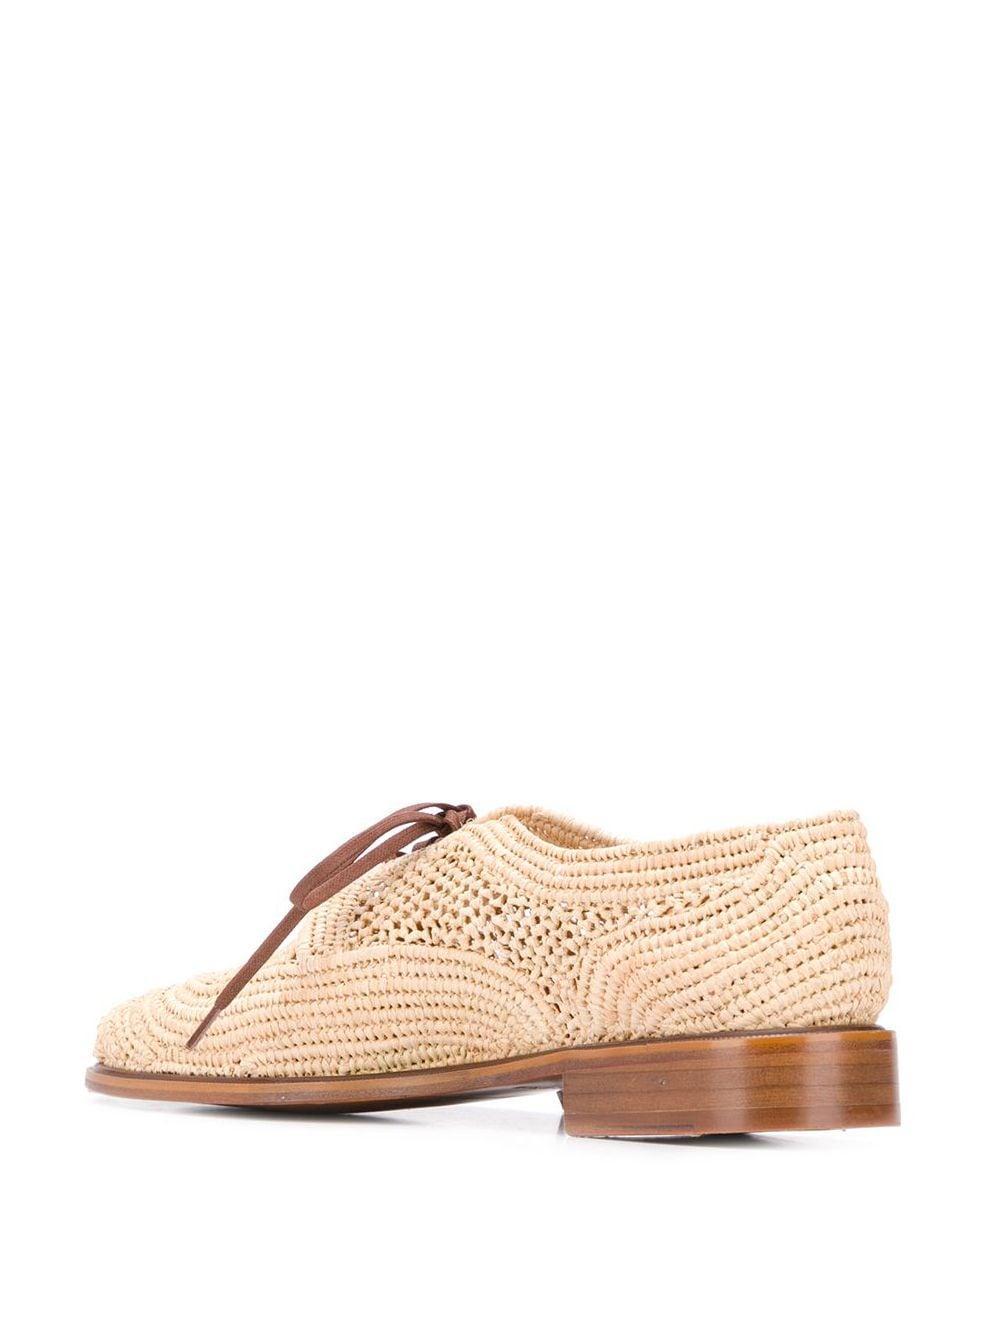 Zapatos Japaille Clergerie de Cuero de color Neutro